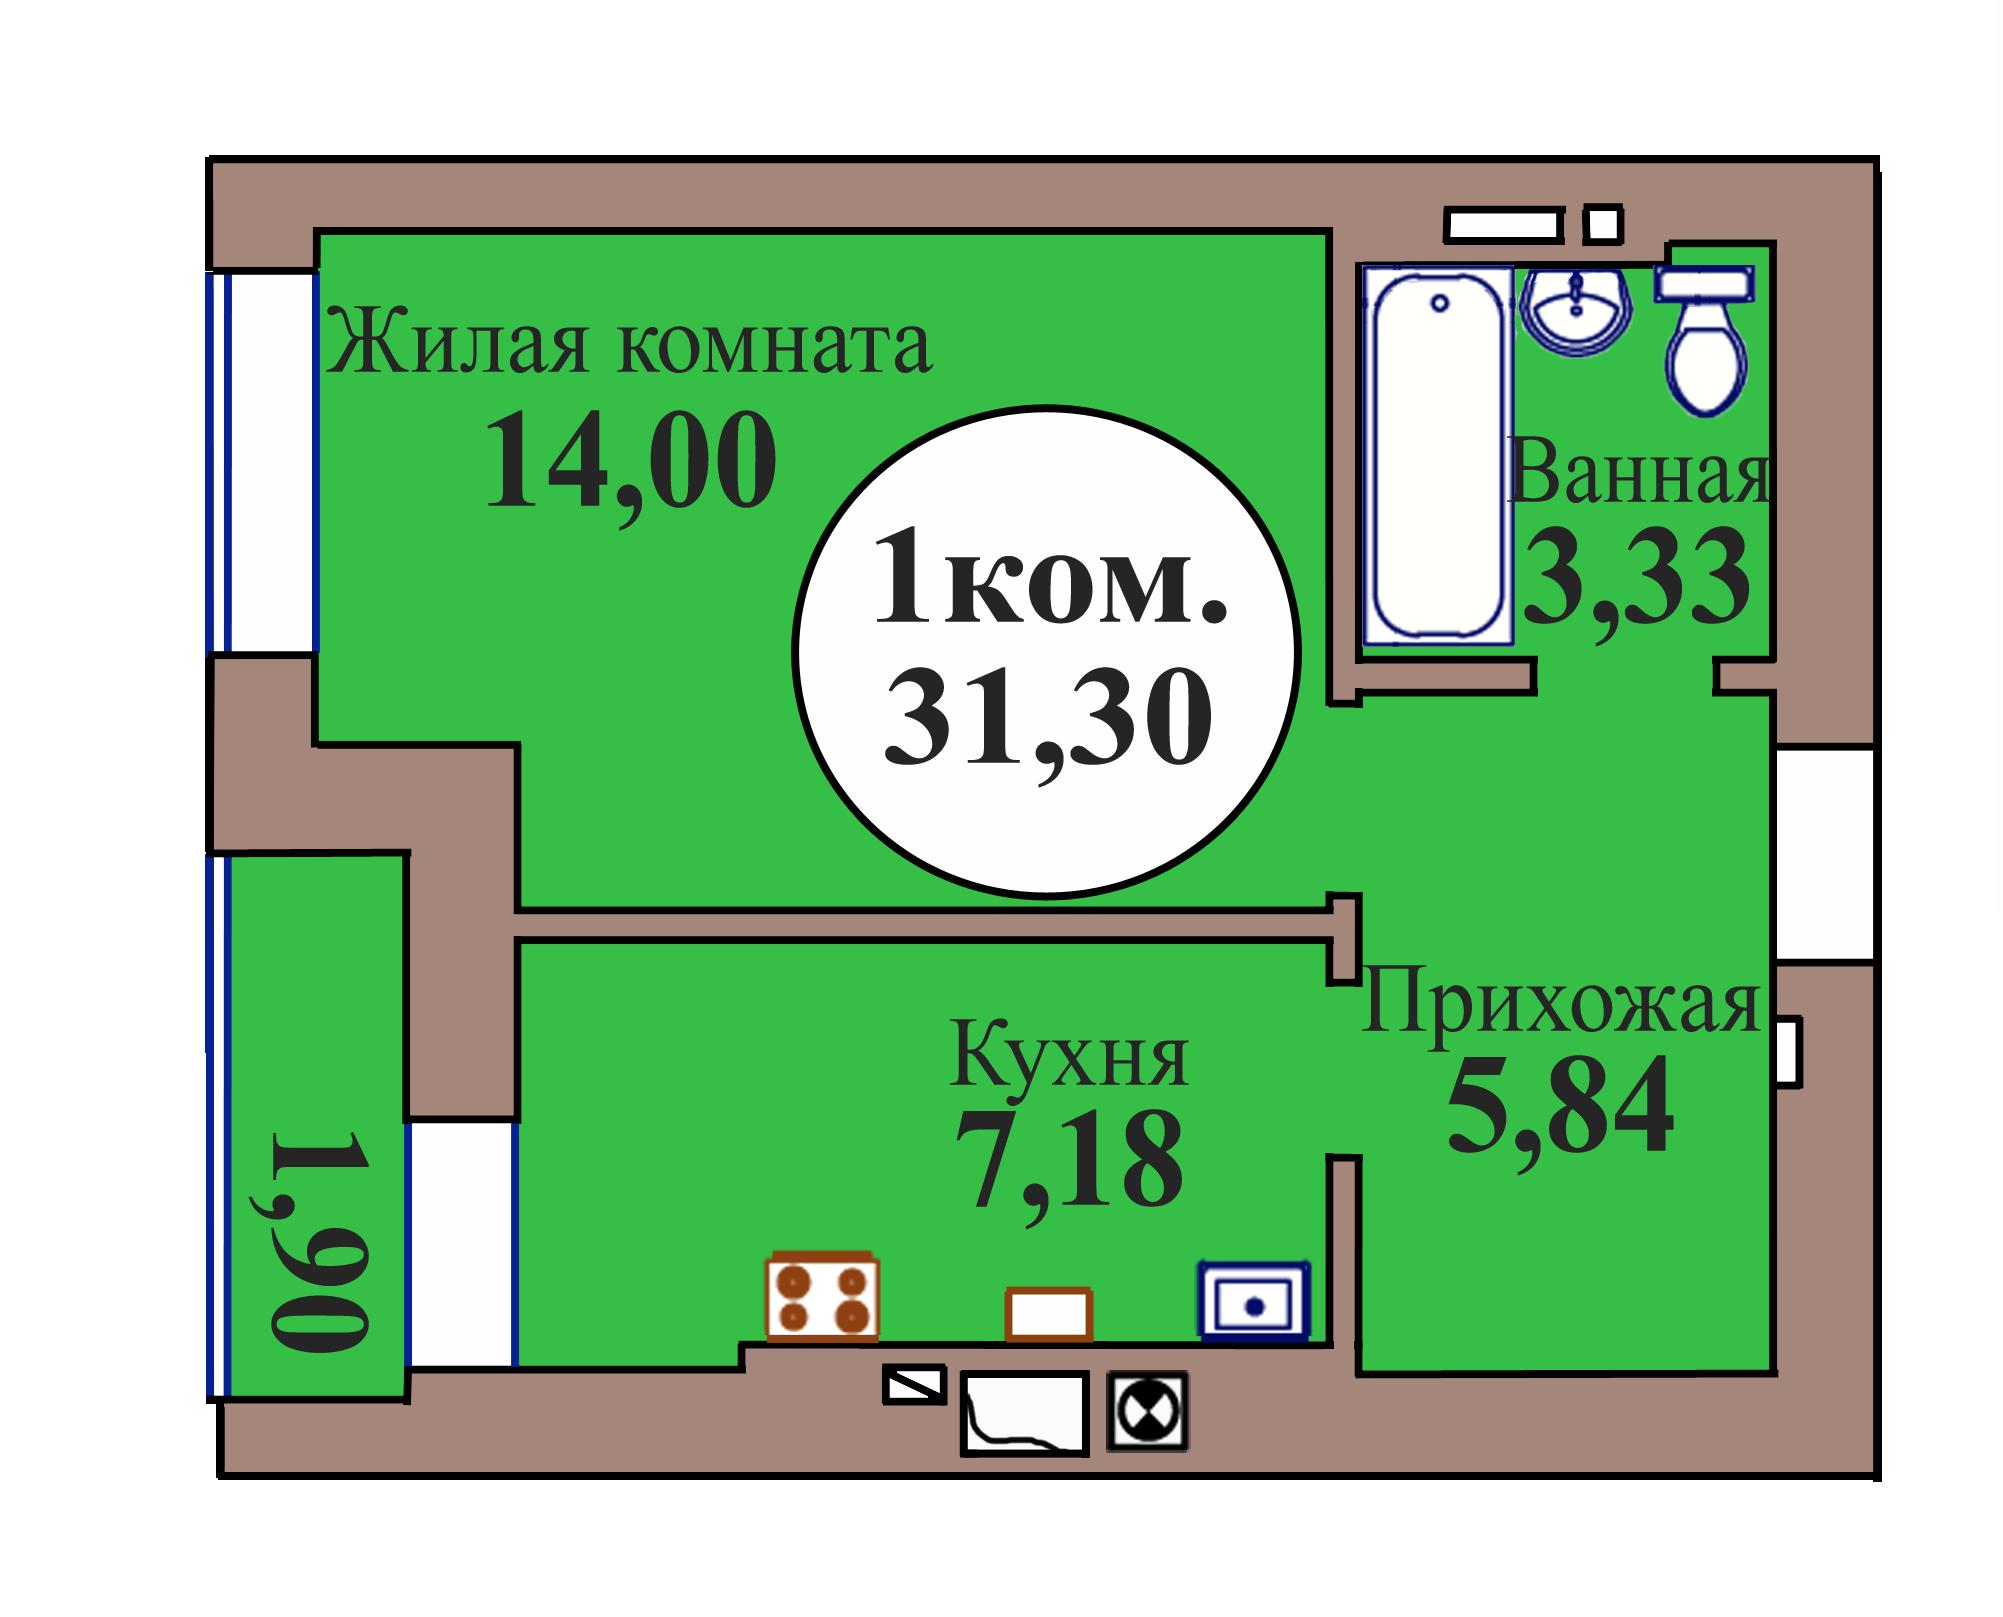 1-комн. кв. по пер. Калининградский, 5 кв. 35 в Калининграде